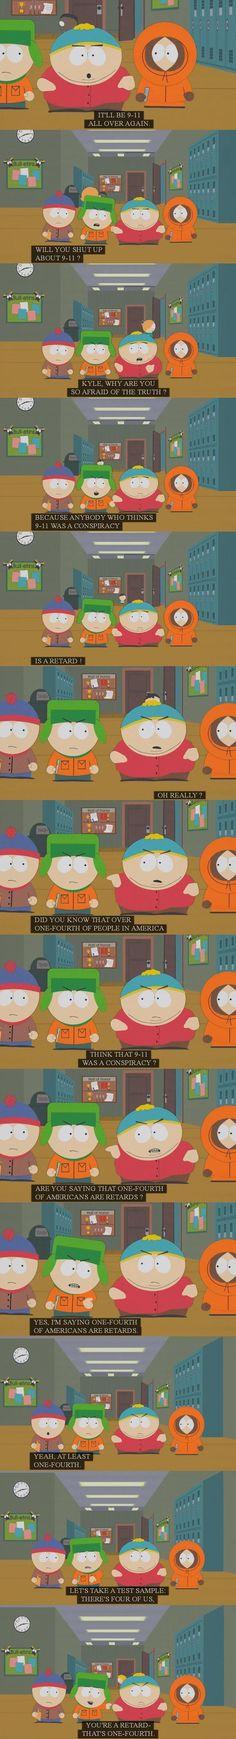 9/11 #funny #lol #humor